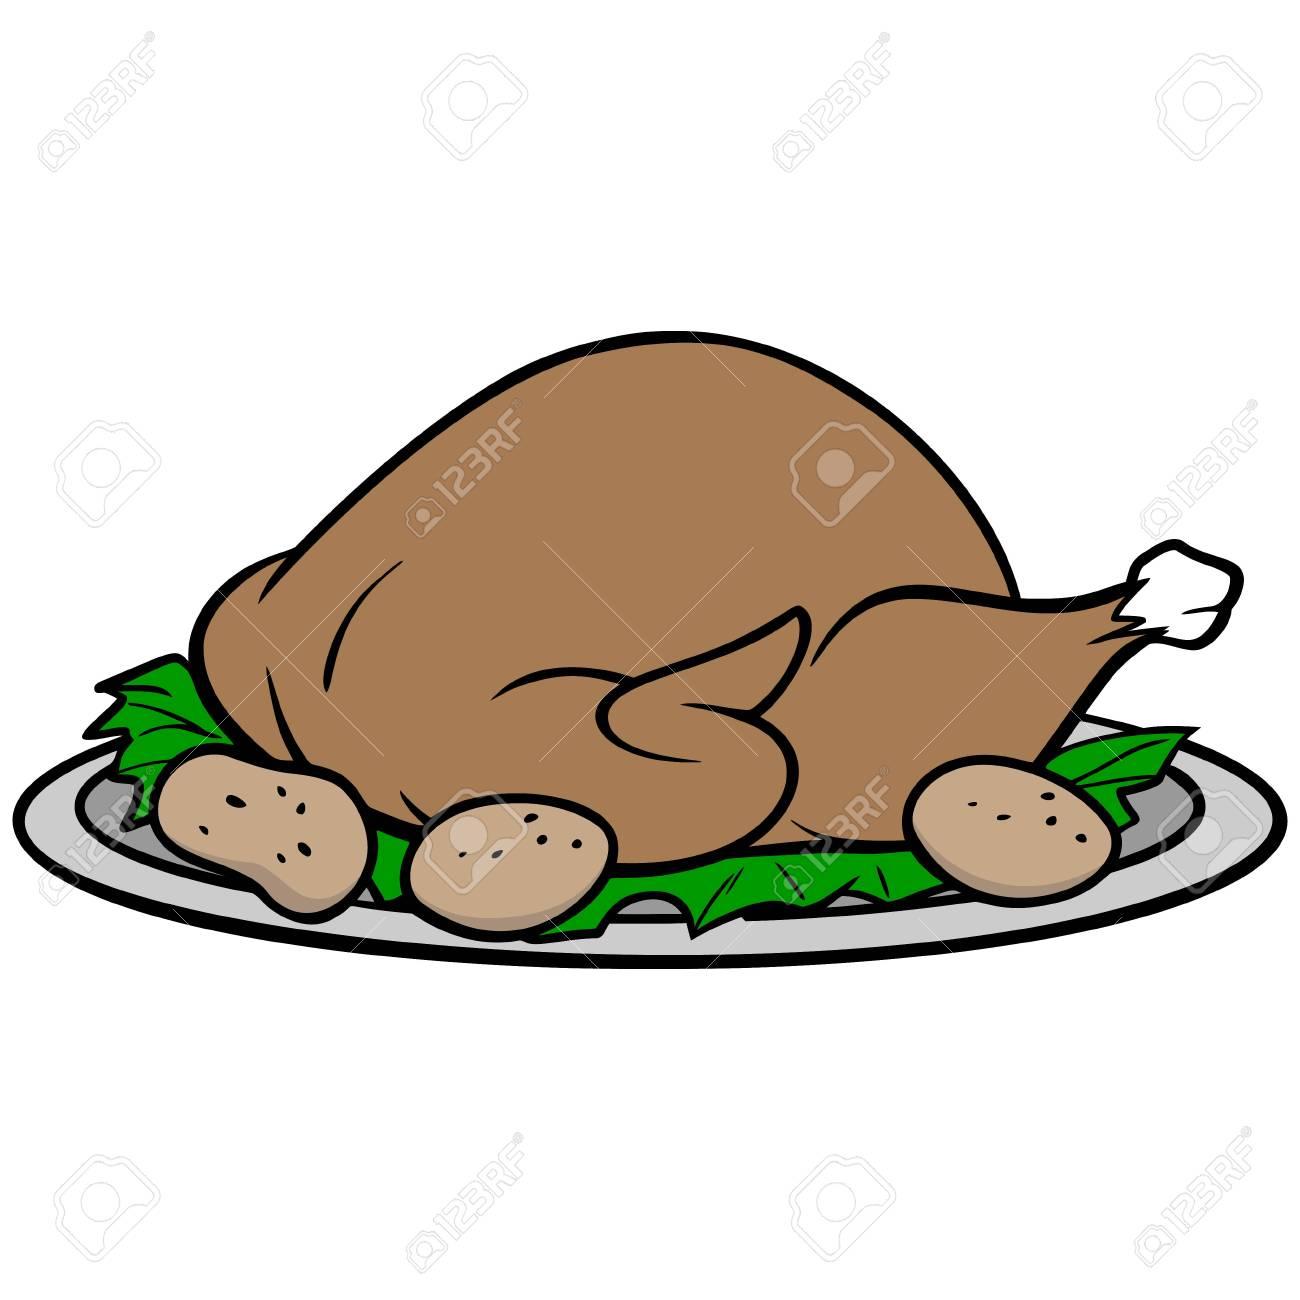 Thanksgiving Dinner SVG turkey svg thanksgiving svgs svg files for  scrapbooking free svg files | Fall scrapbook layouts, Fall scrapbook, Baby clip  art